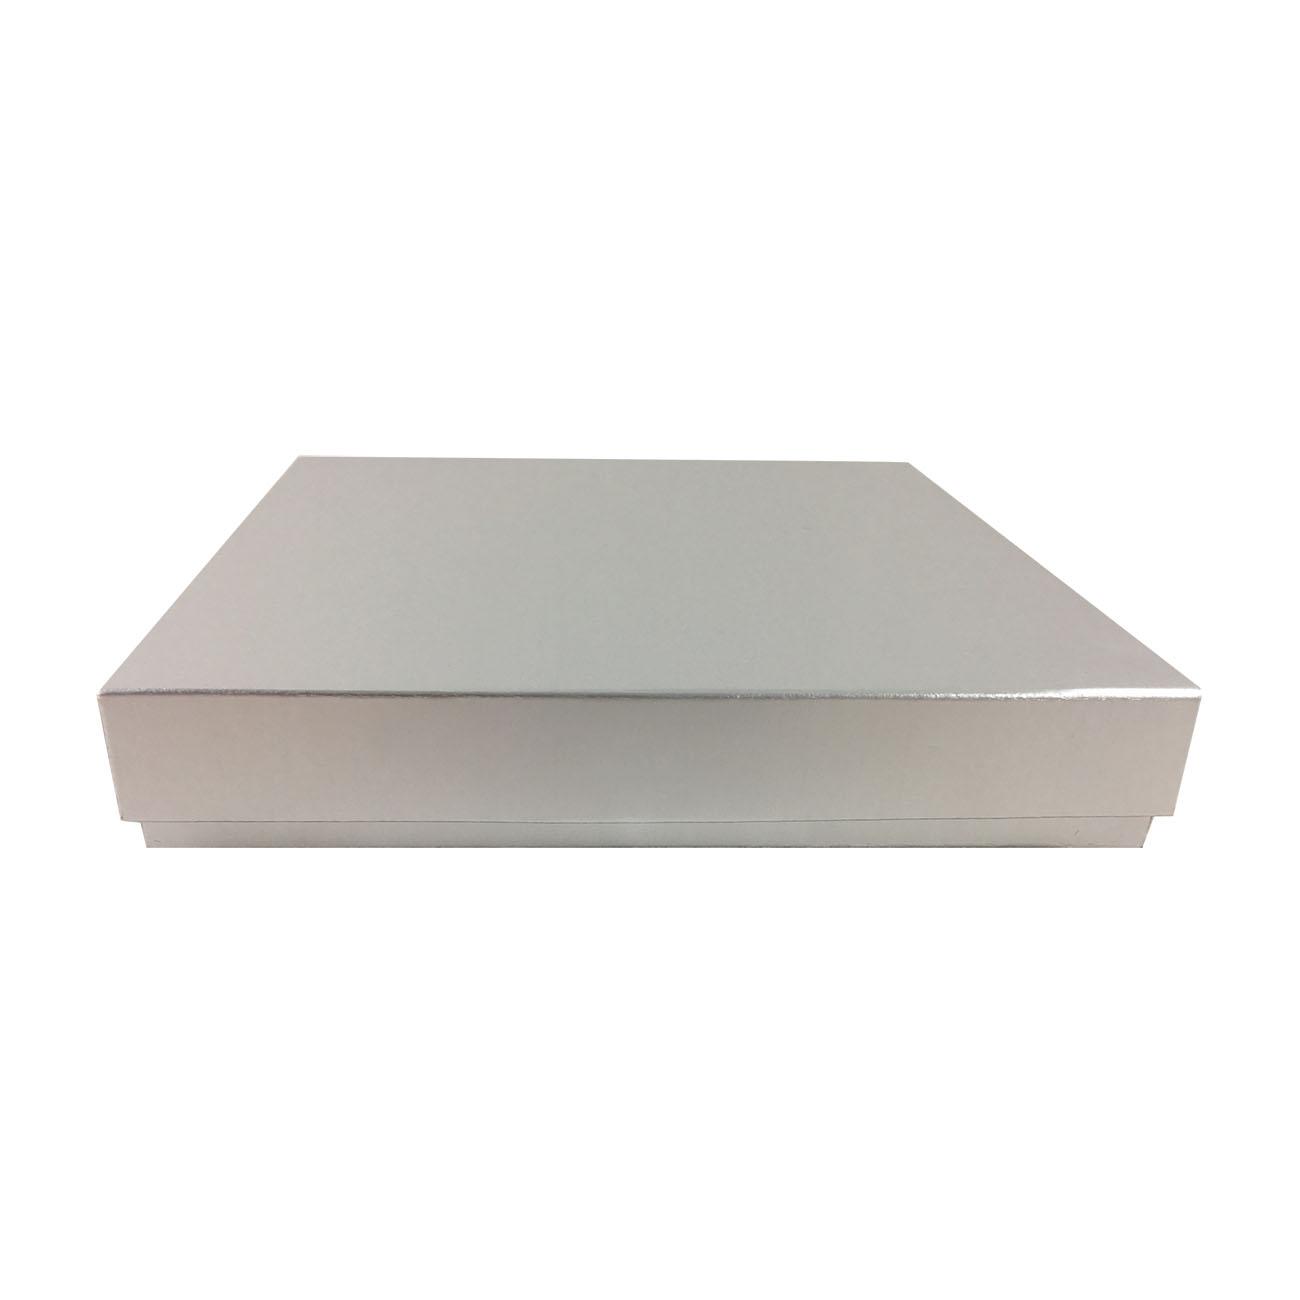 aluminium look cardboard box for mailer packaging